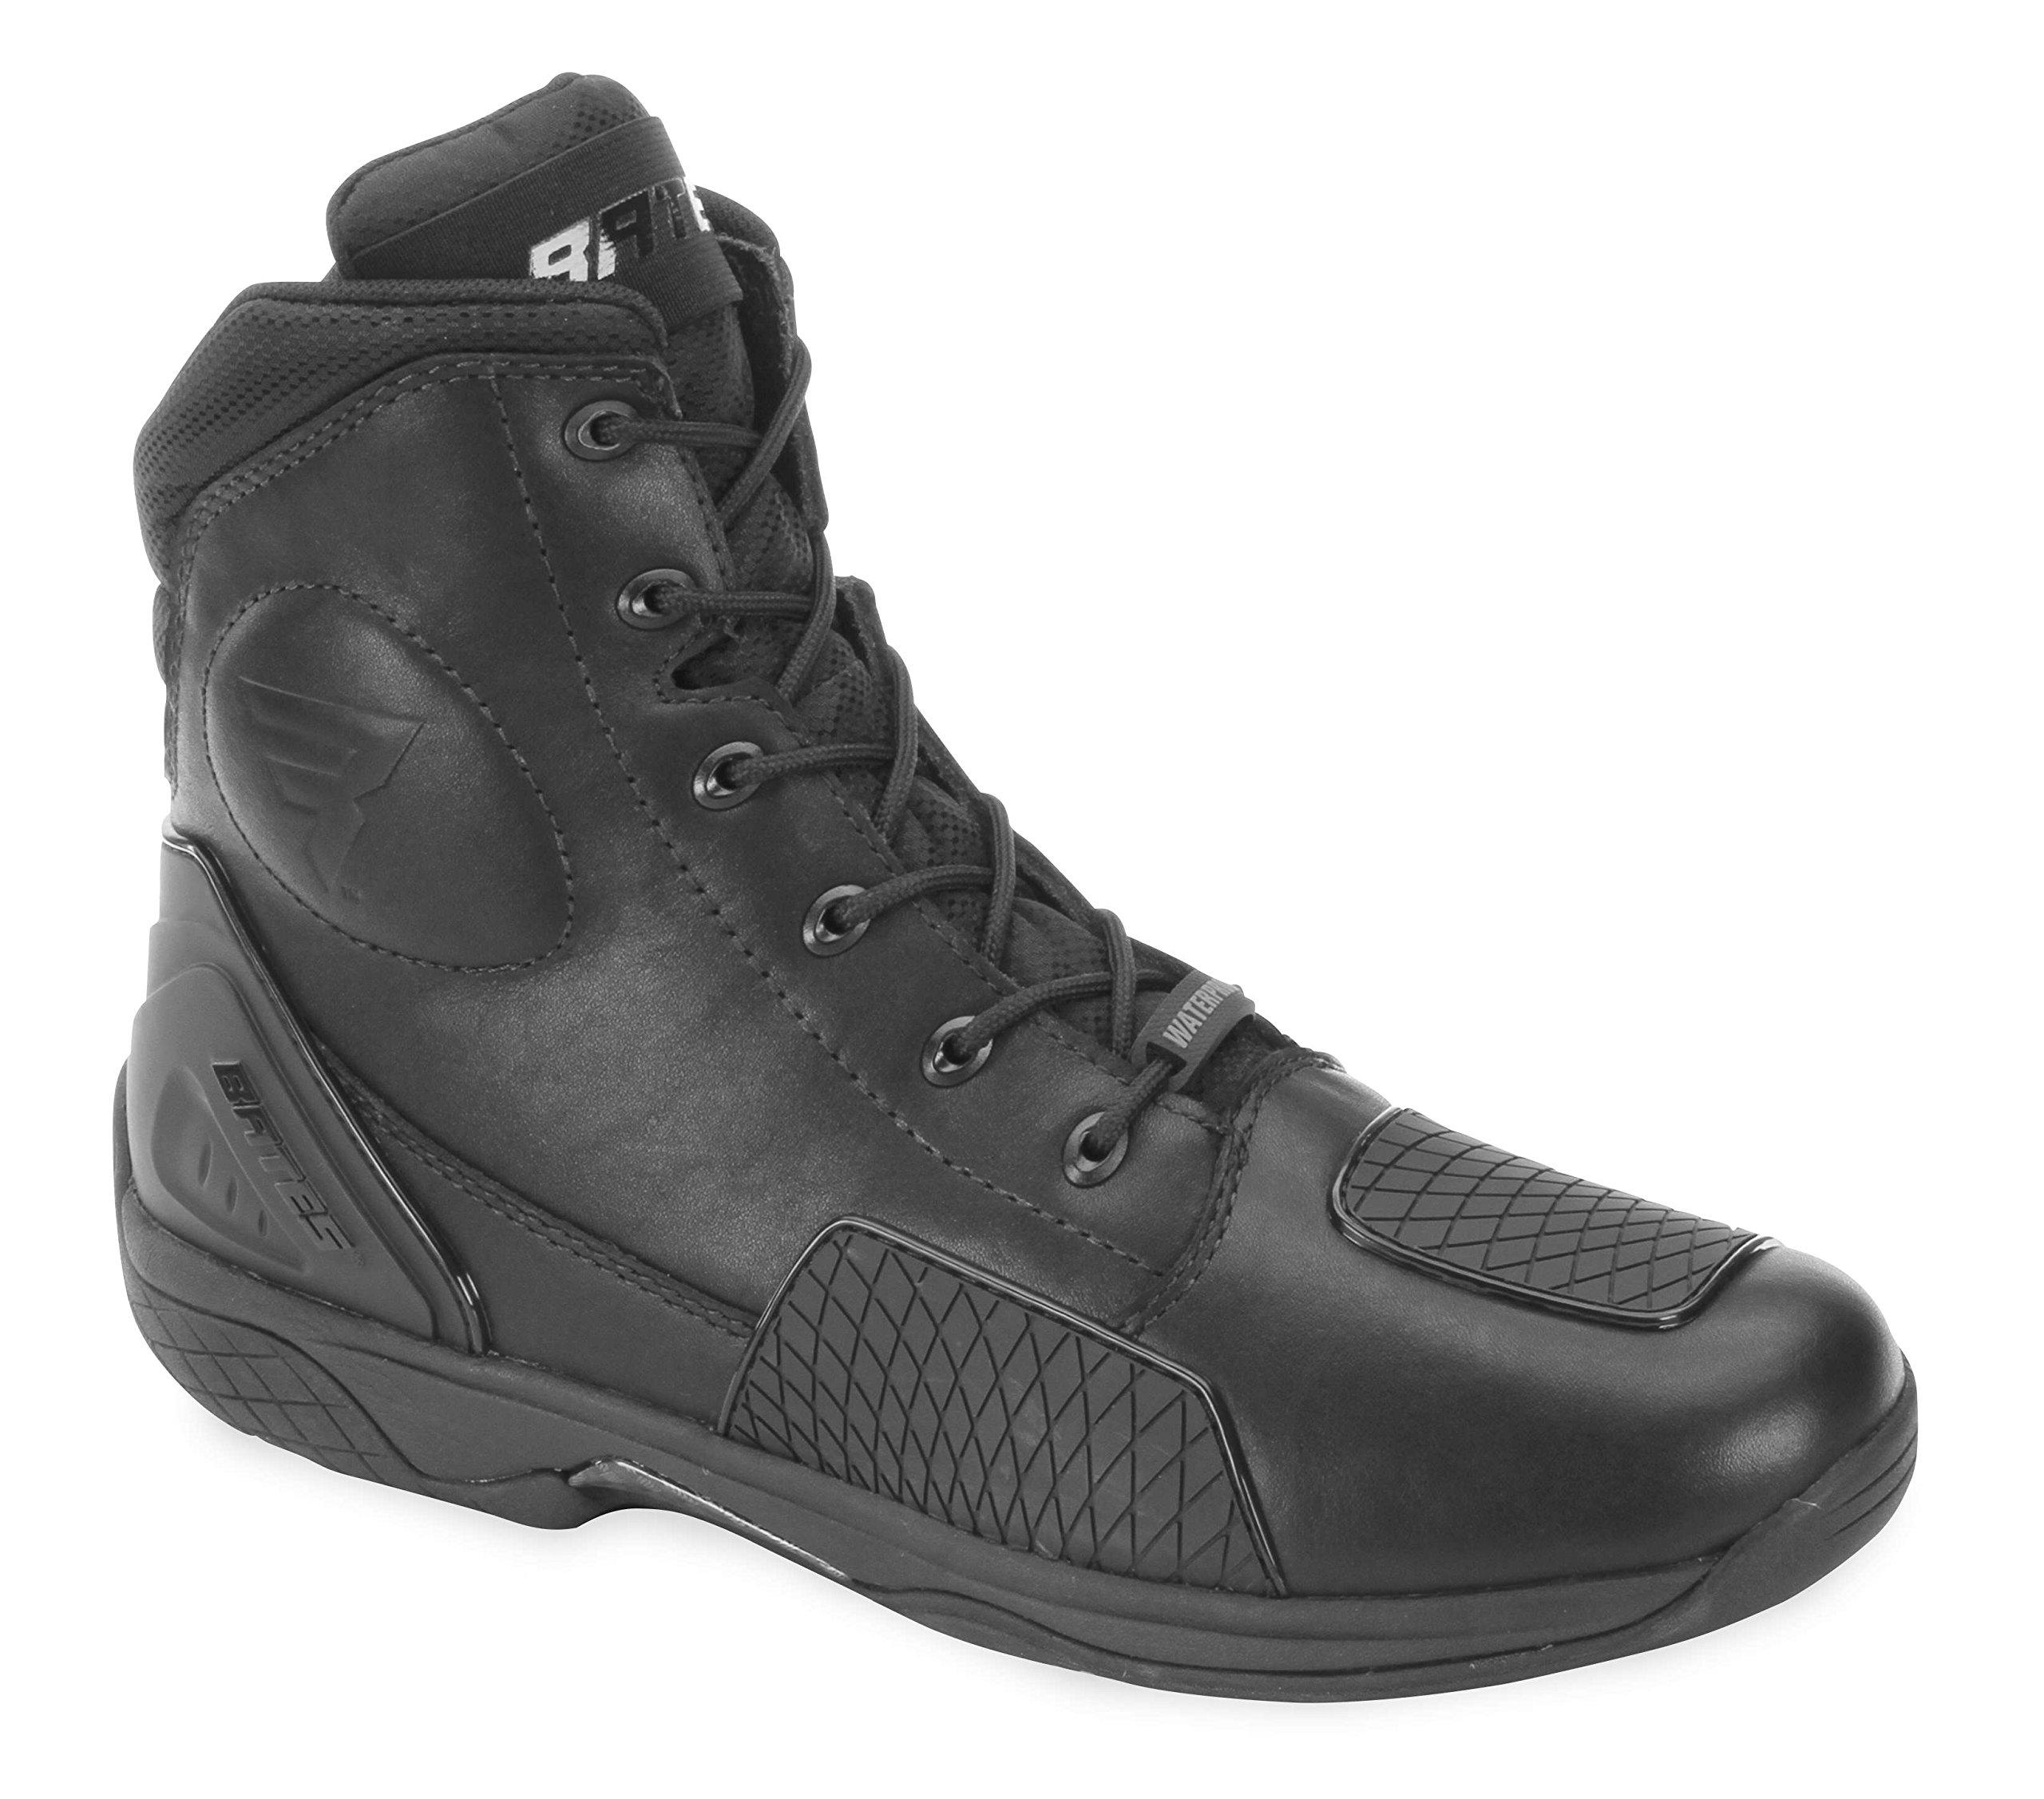 Bates Adrenaline Performance Men's Motorcycle Boots (Black, Size 10.5)